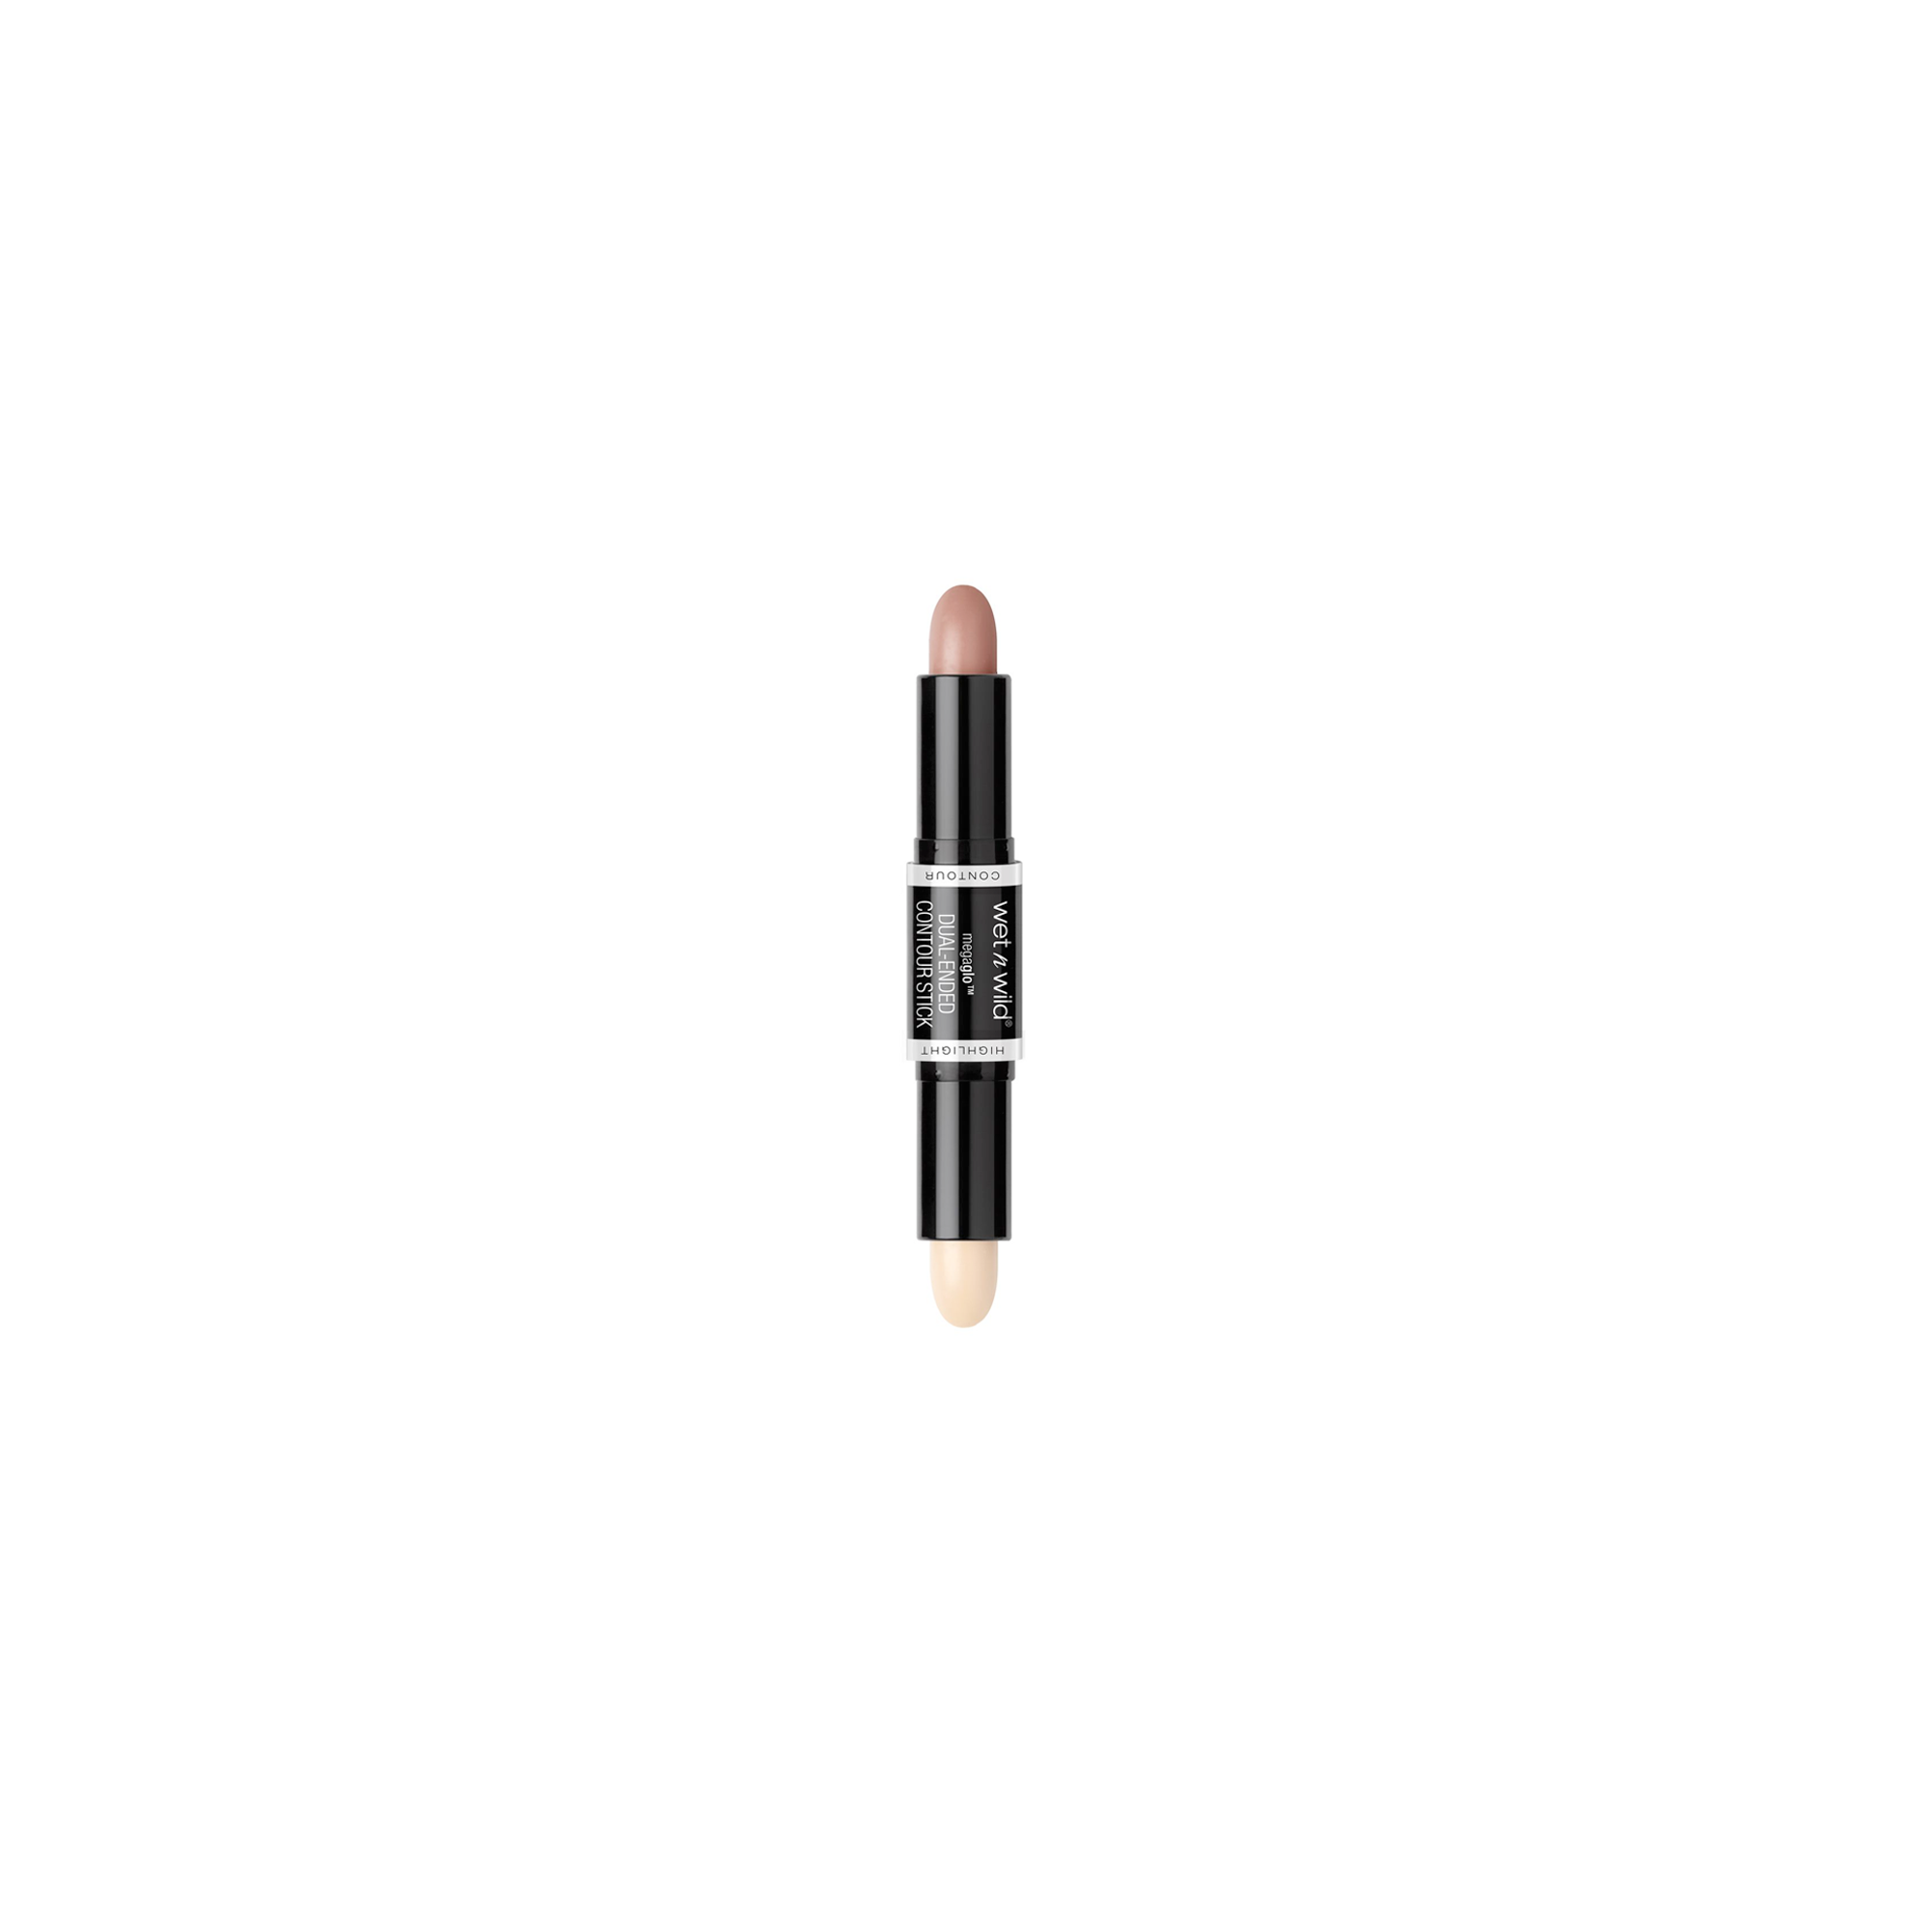 Wet n Wild MegaGlo Dual-Ended Contour Stick Light Medium